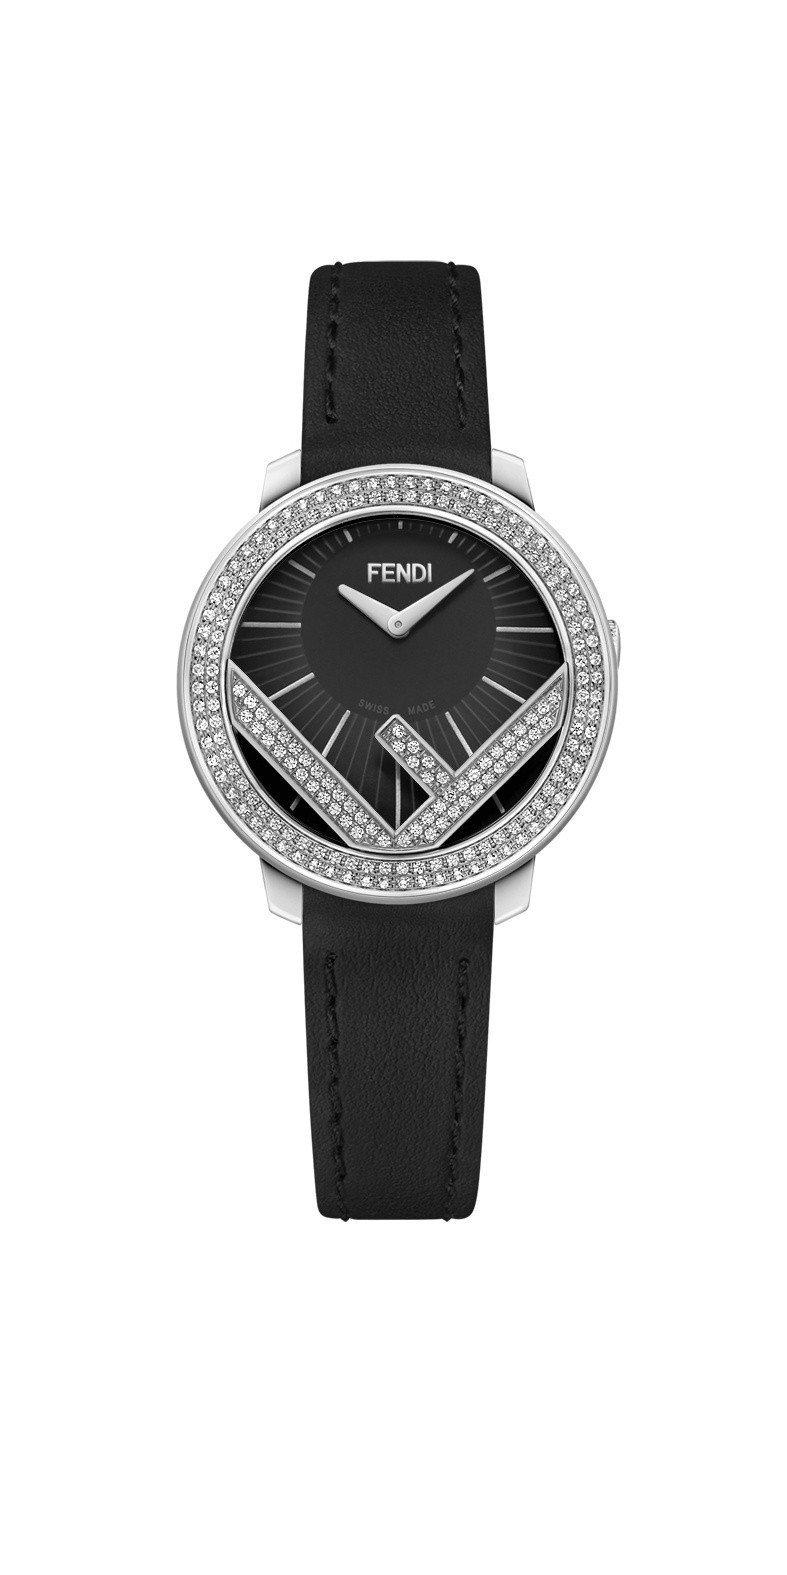 FENDI 101 開幕活動獨家商品 Runaway 鑽表,11萬8,000元。...